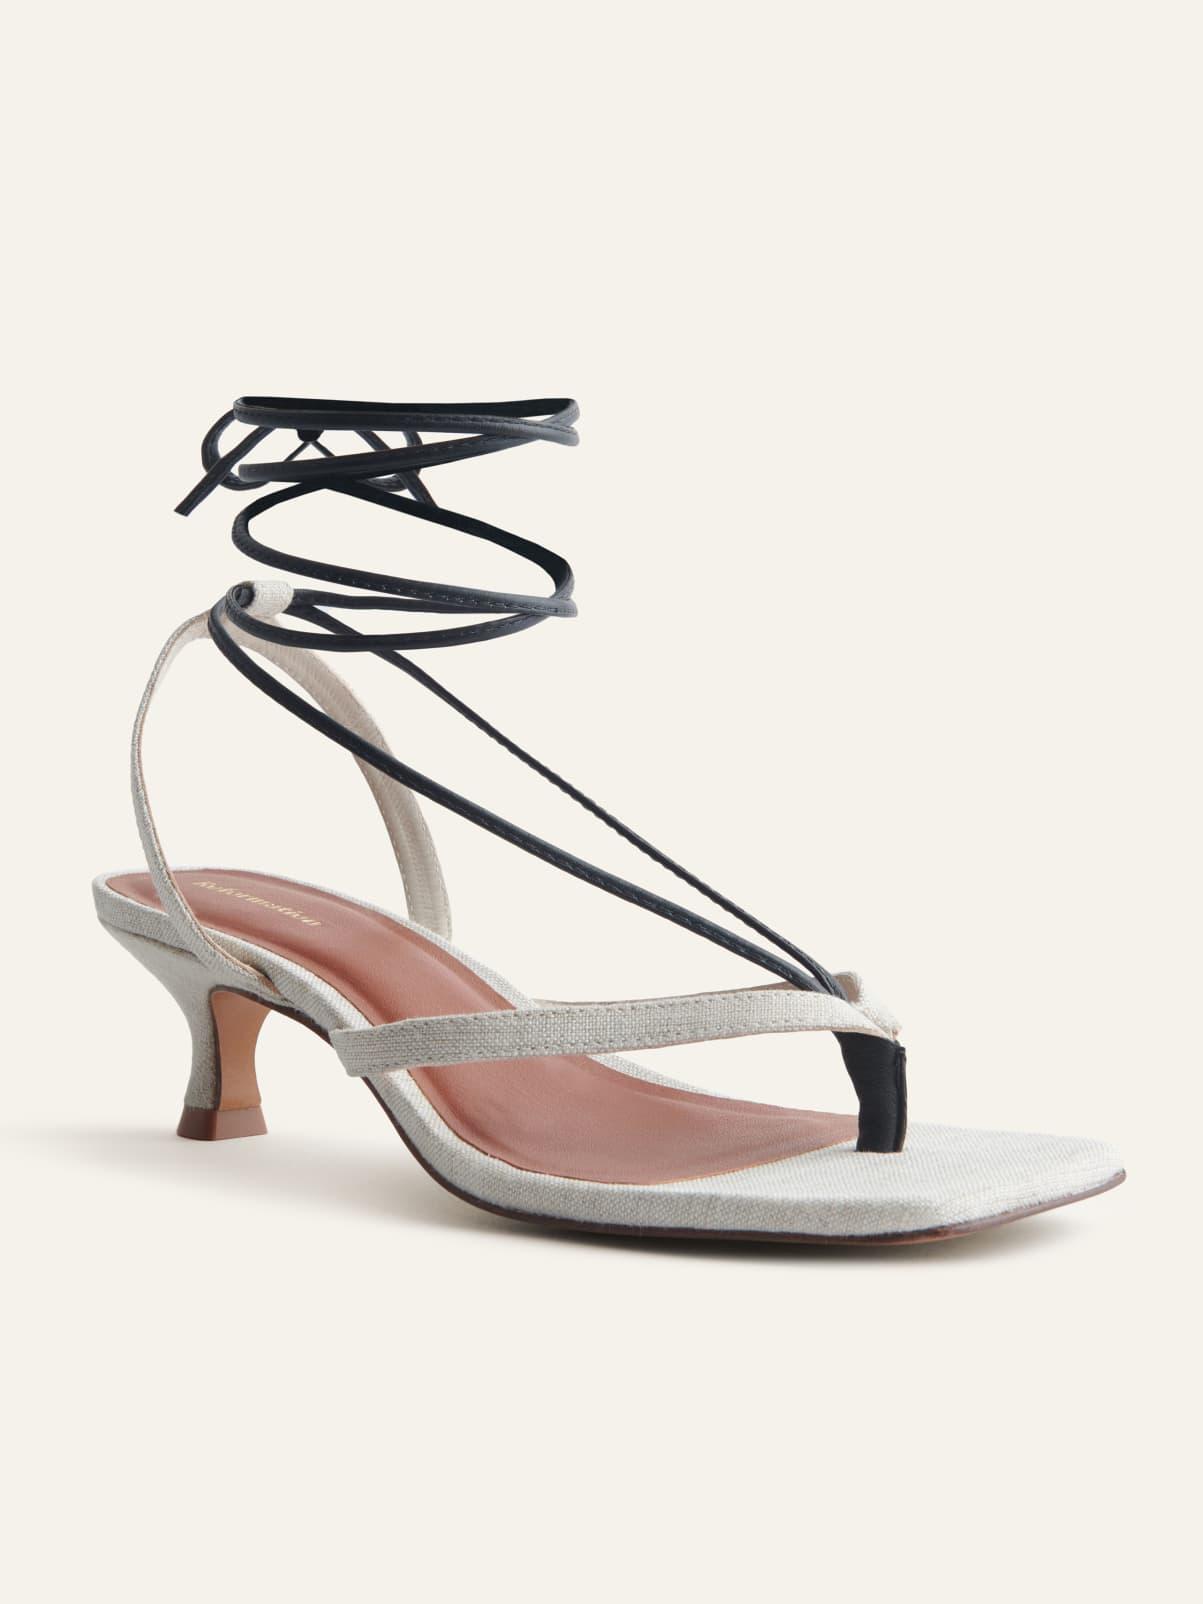 Reformation Shoes Selene Lace Up Kitten Heels Sandal